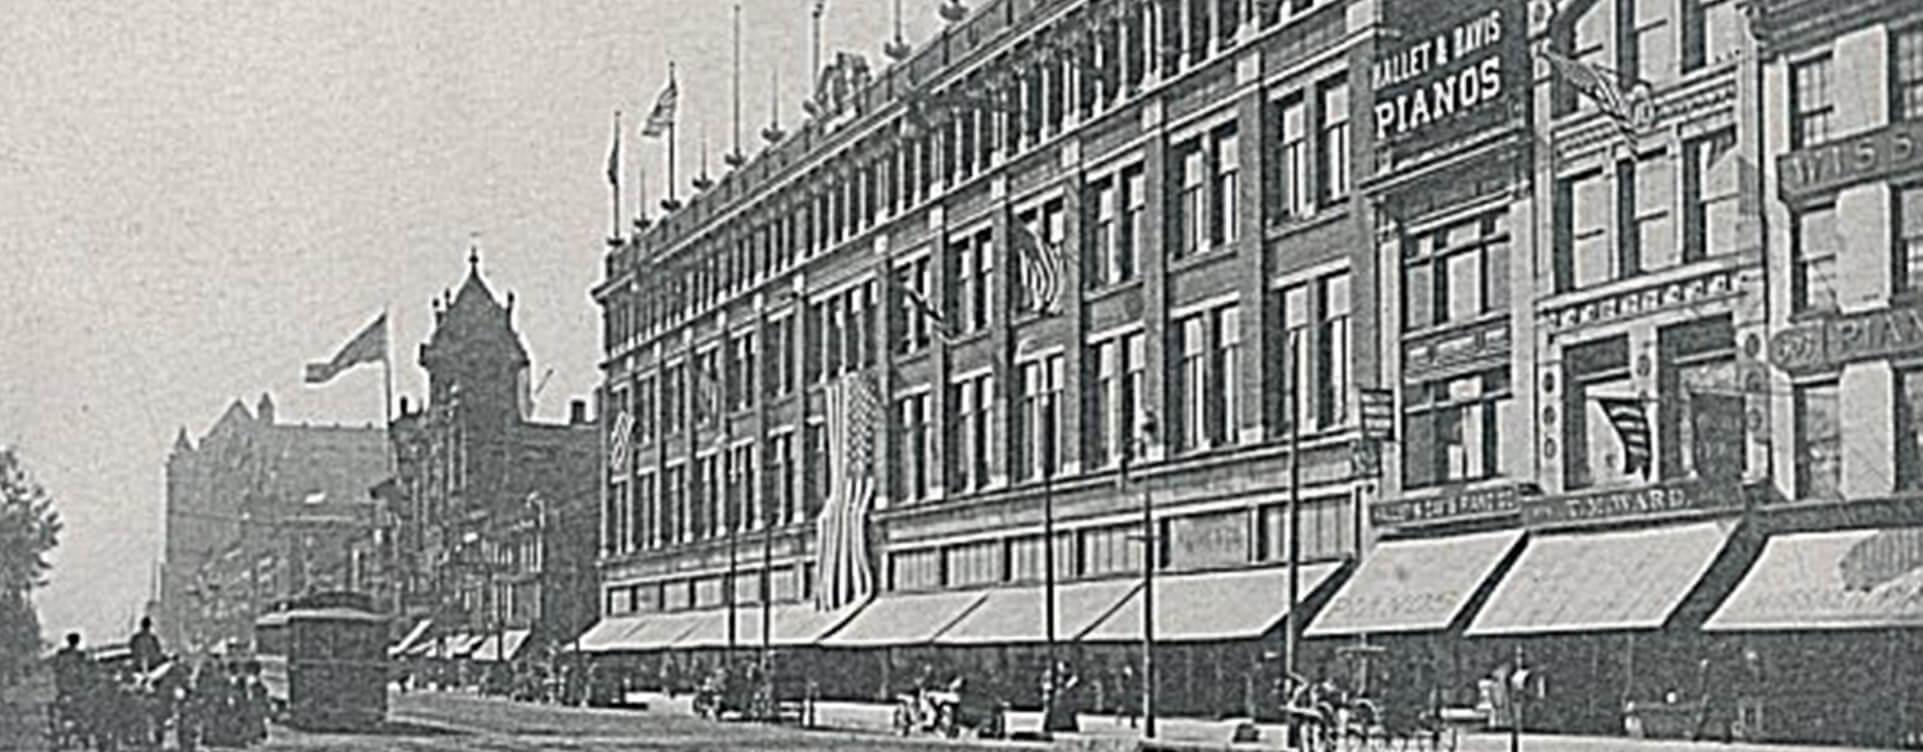 historically banner 2